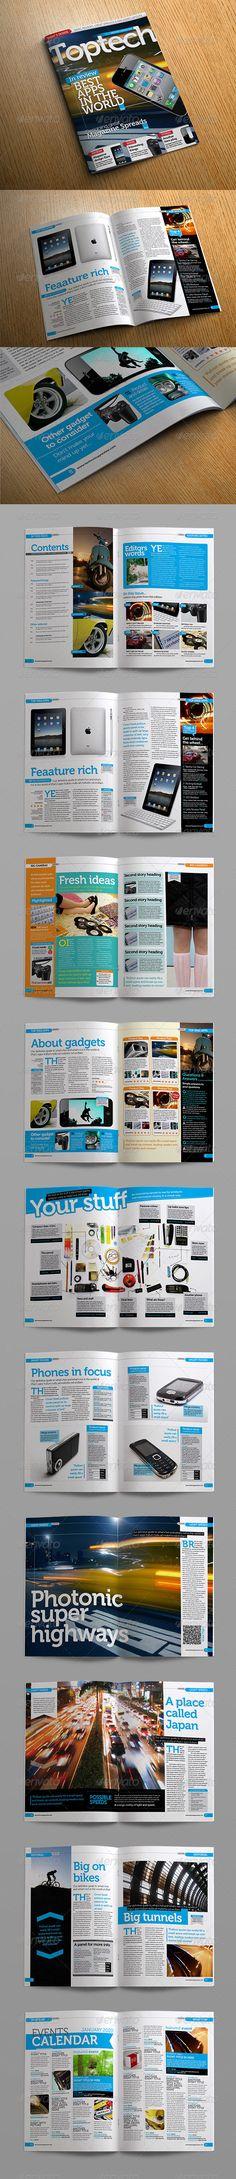 Tech Reviews Magazine Template - Magazines Print Templates